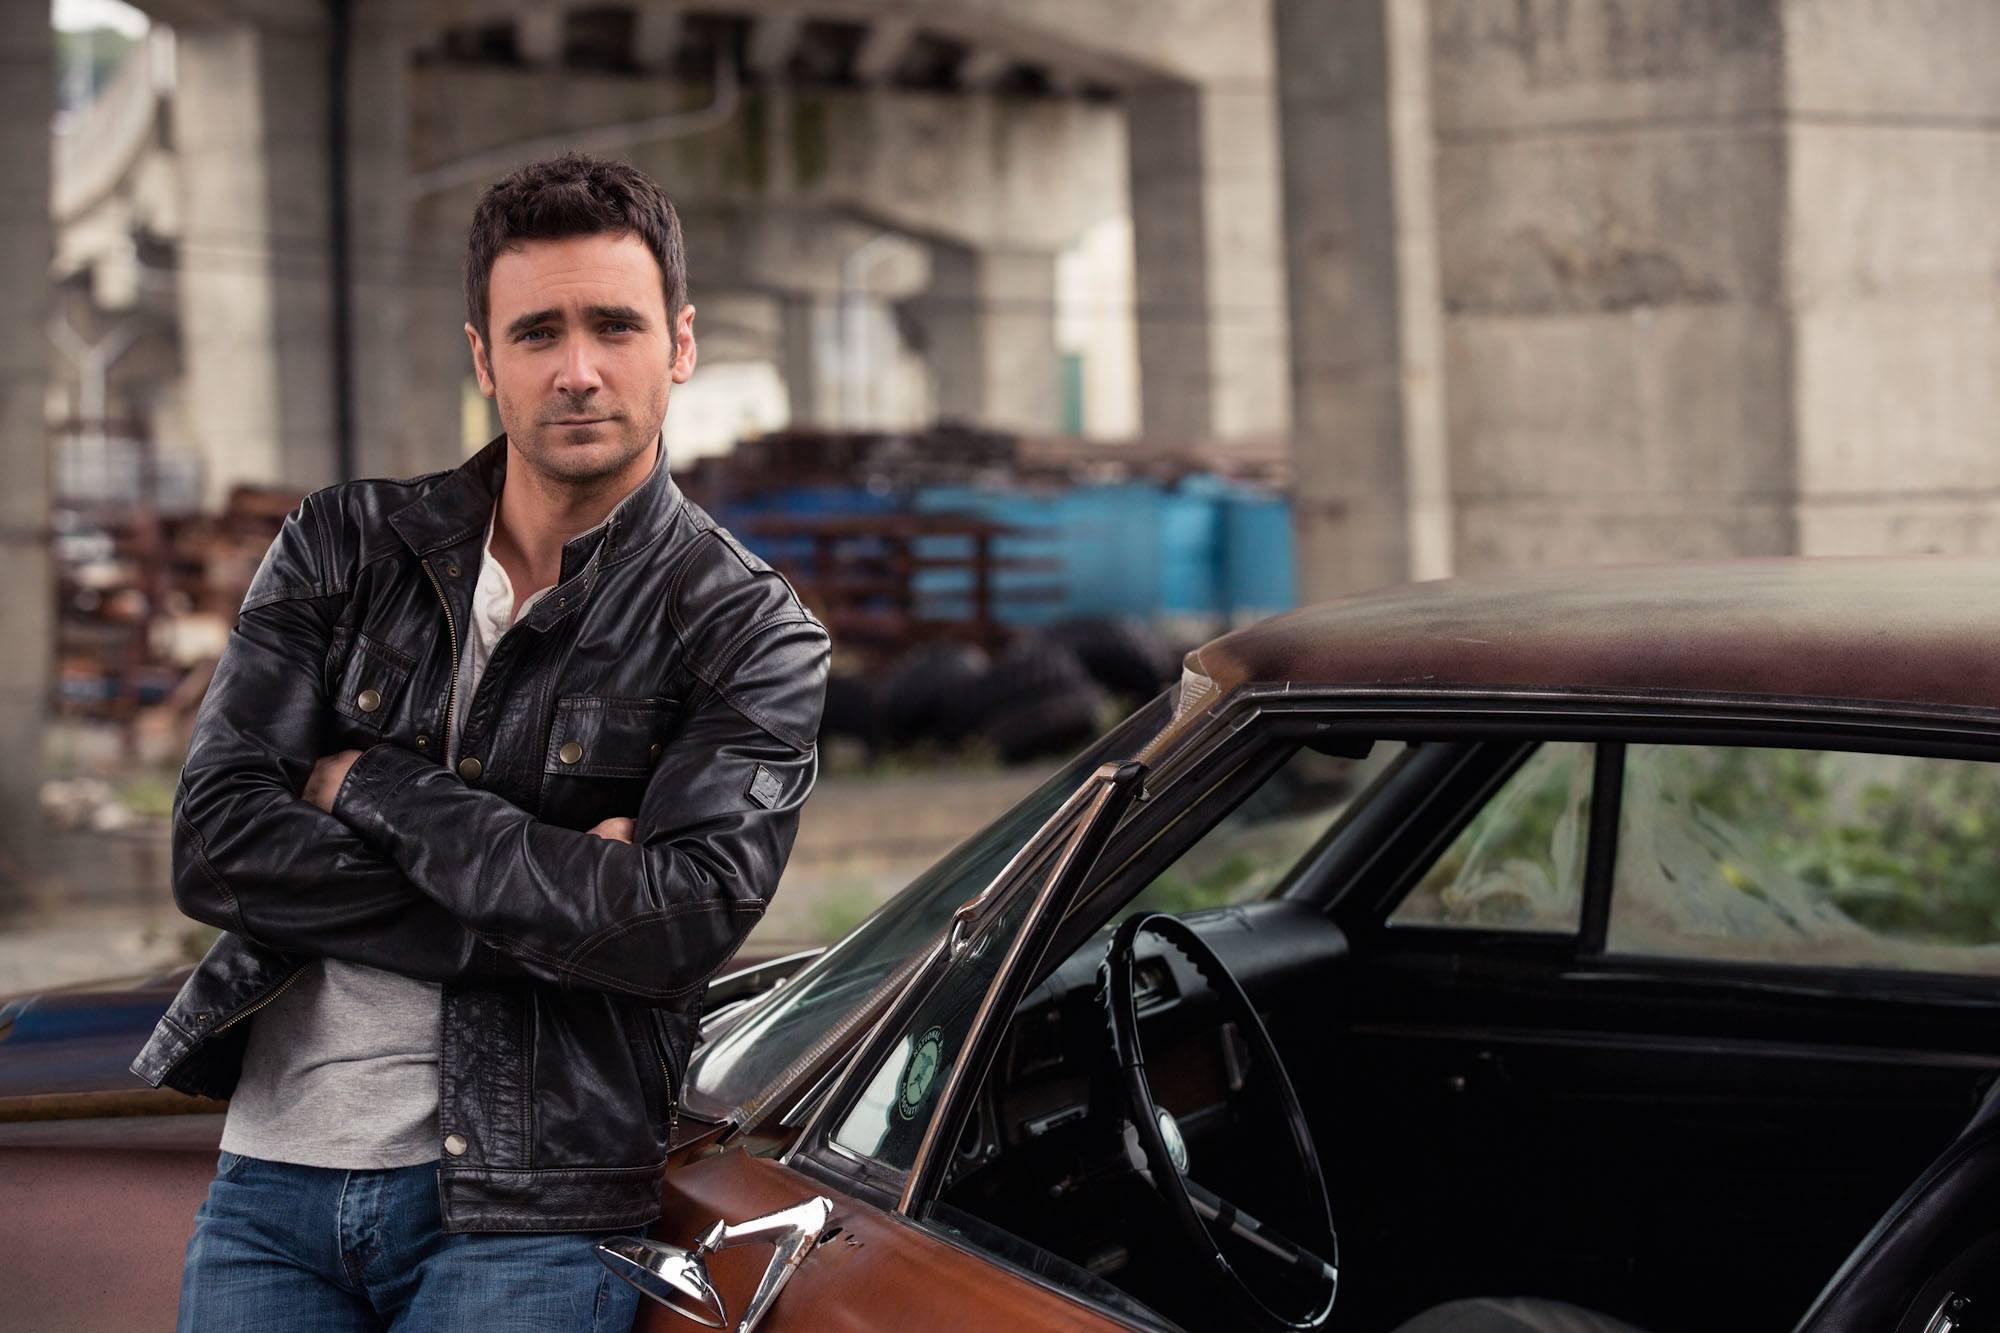 Binge TV - Jake Doyle: Bad Boy with a Good Heart, the three tomatoes